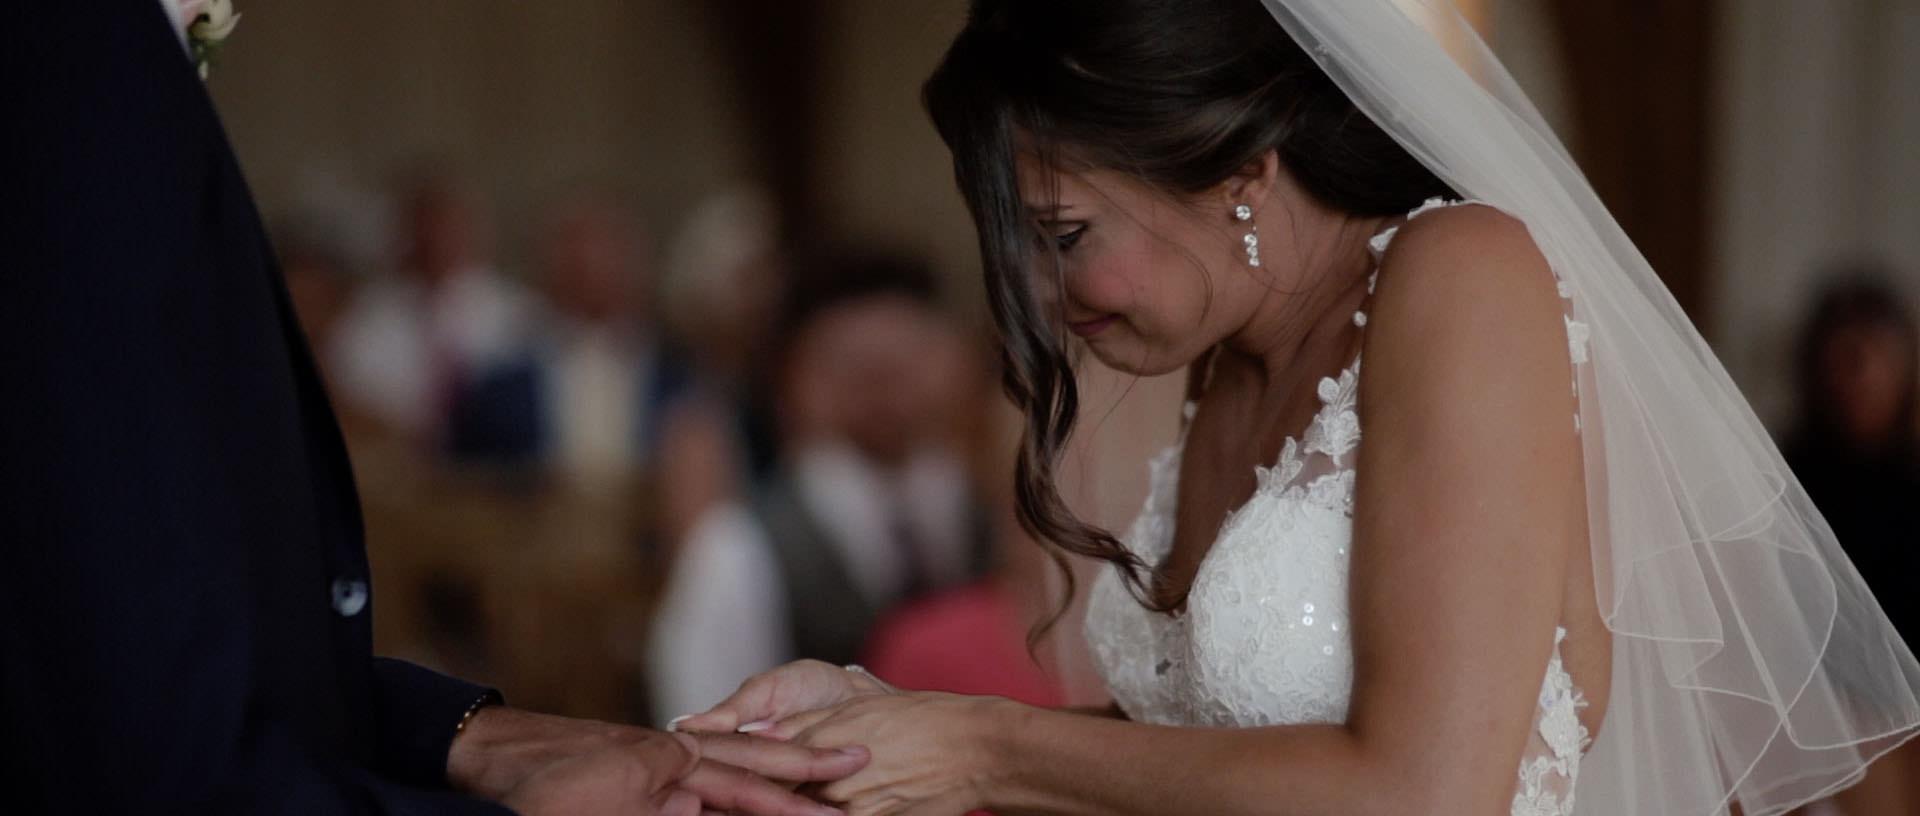 Hyde Barn Colswolds Wedding Verity-Jade & Kai 21 Cropped.jpg